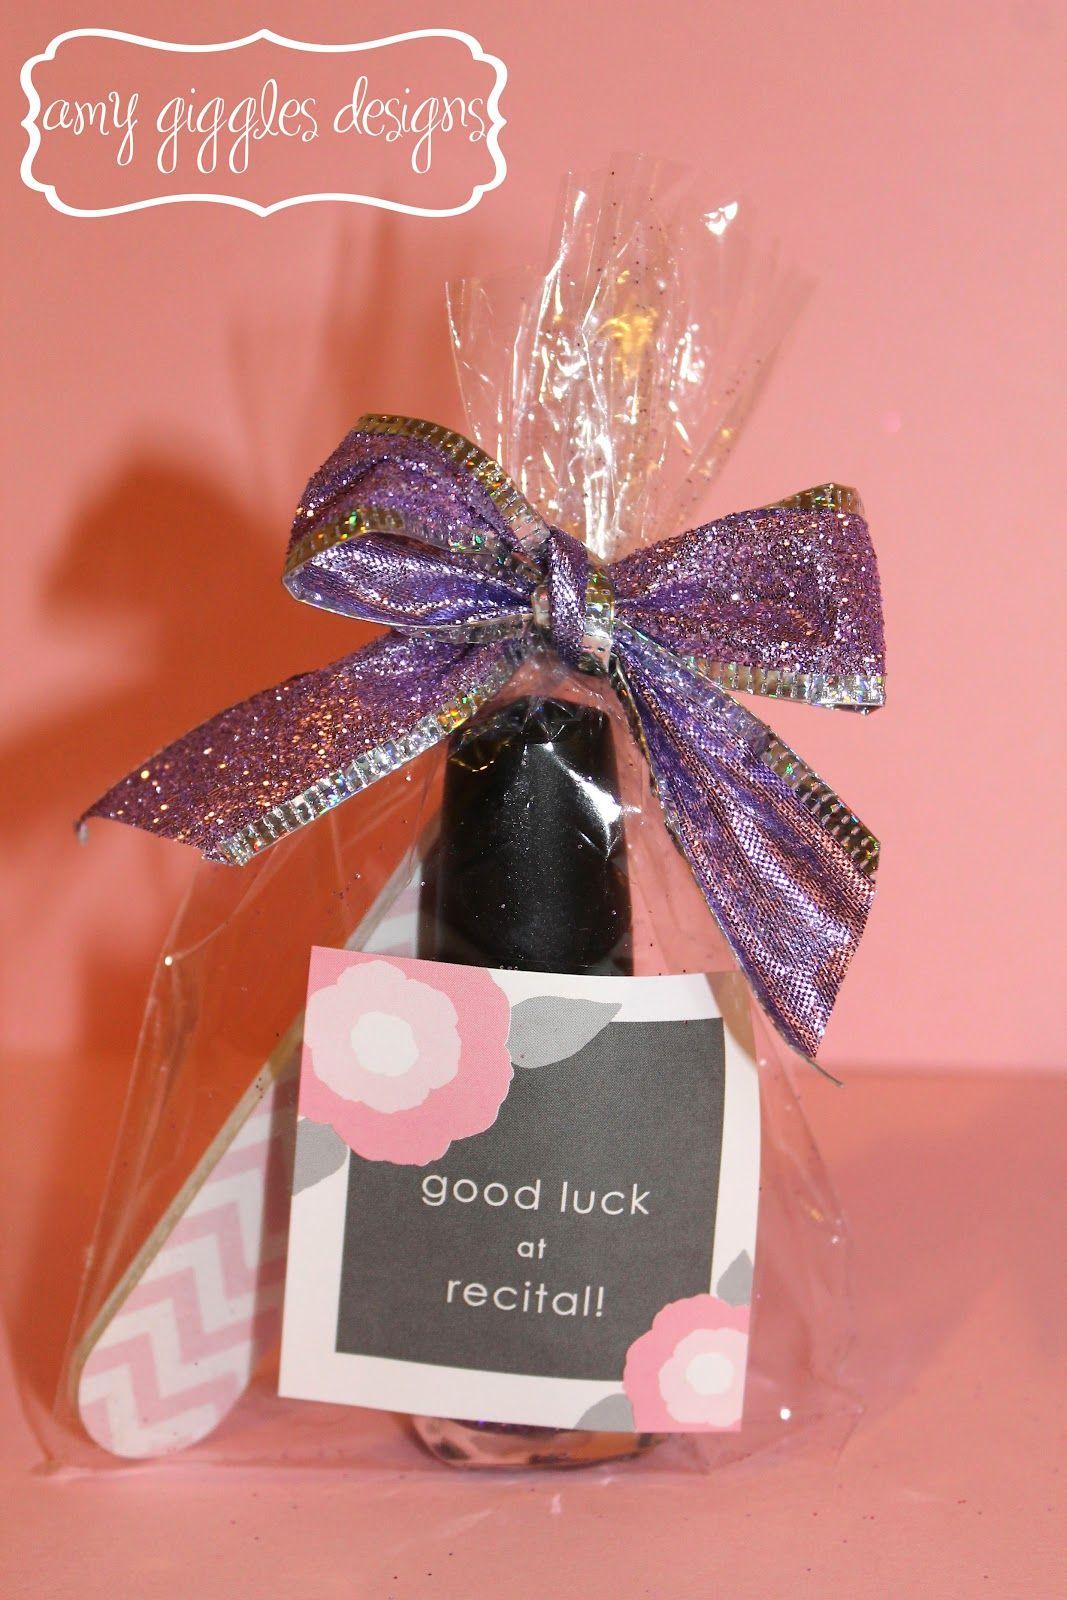 Nail Polish Dance Recital Gifts Amy Giggles Designs Dance Recital Gifts Dance Team Gifts Dancer Gift